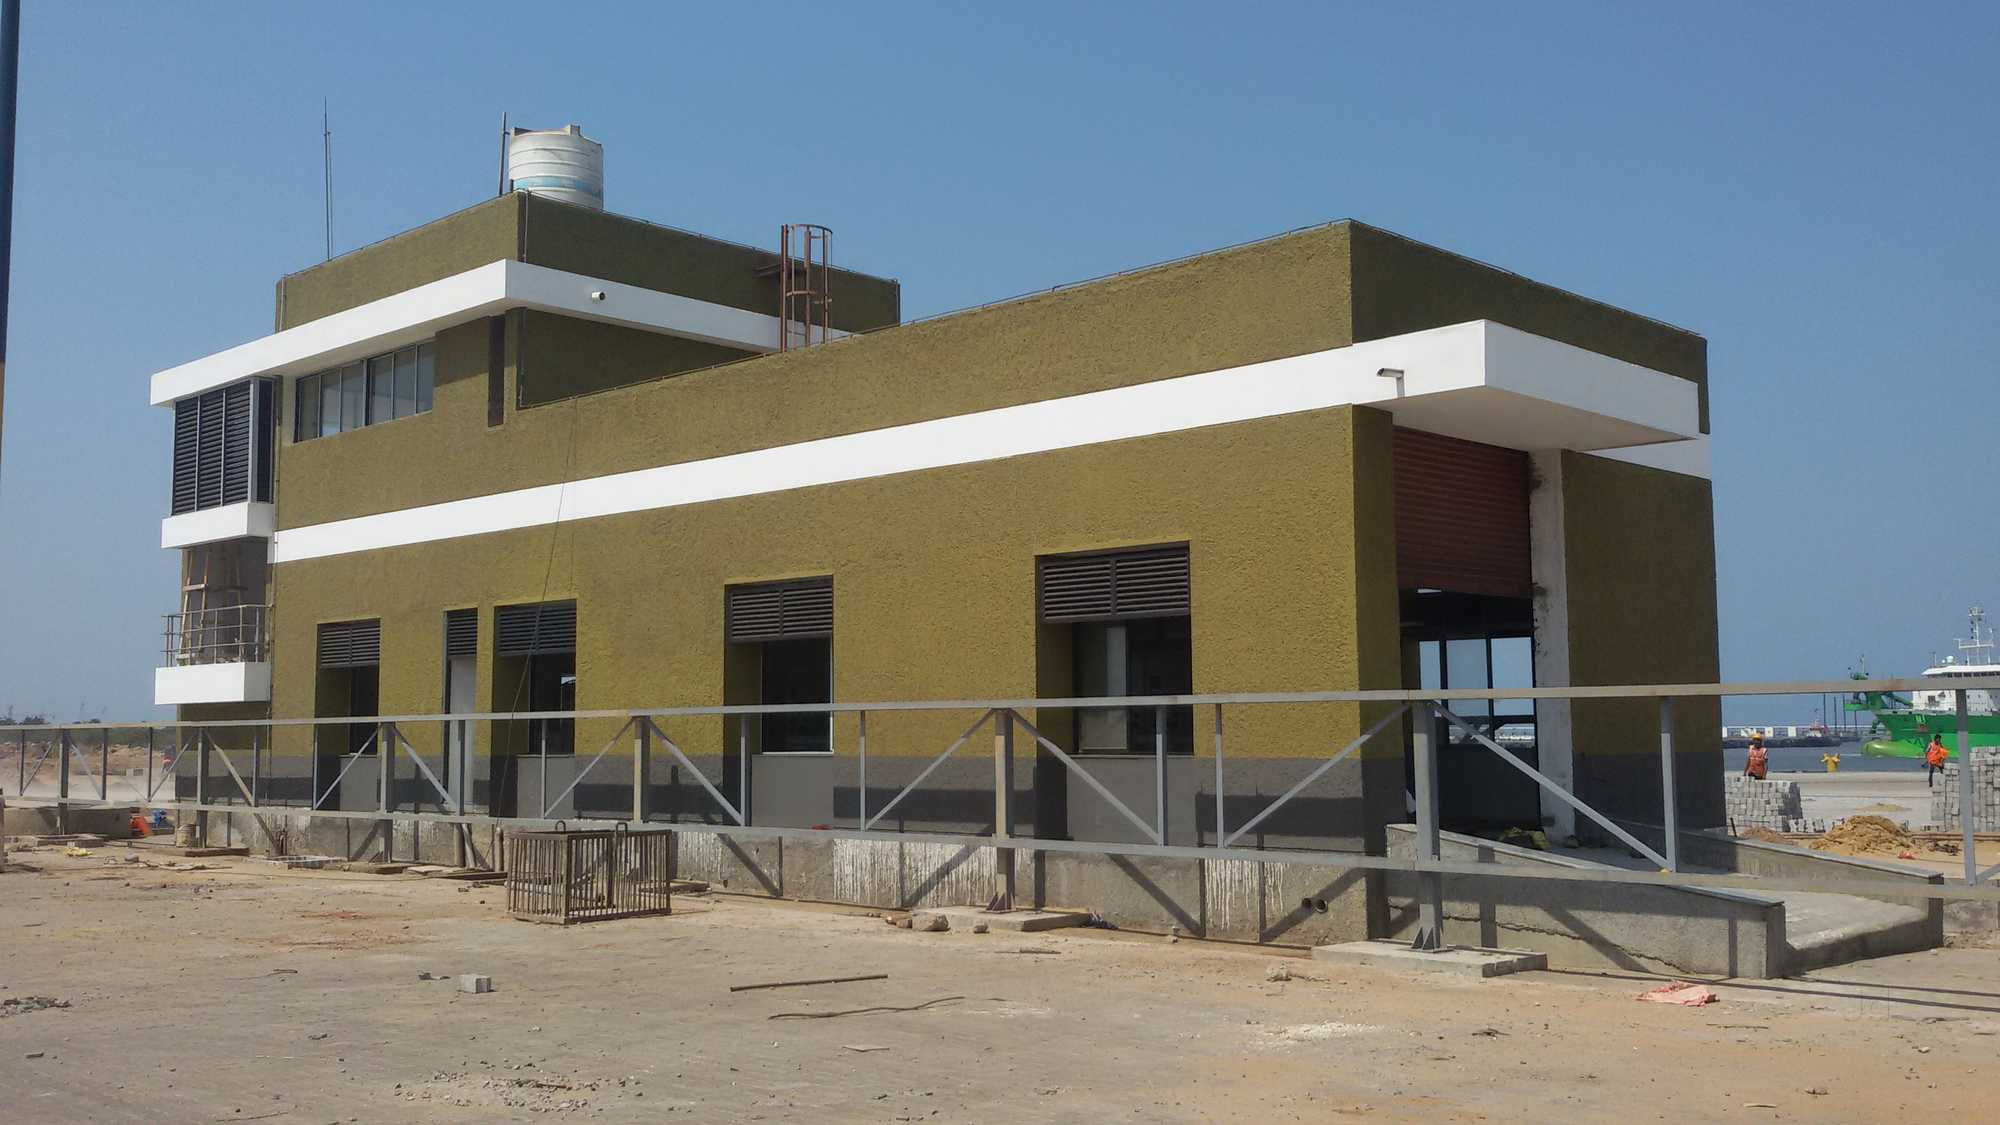 Kshemankari Constructions